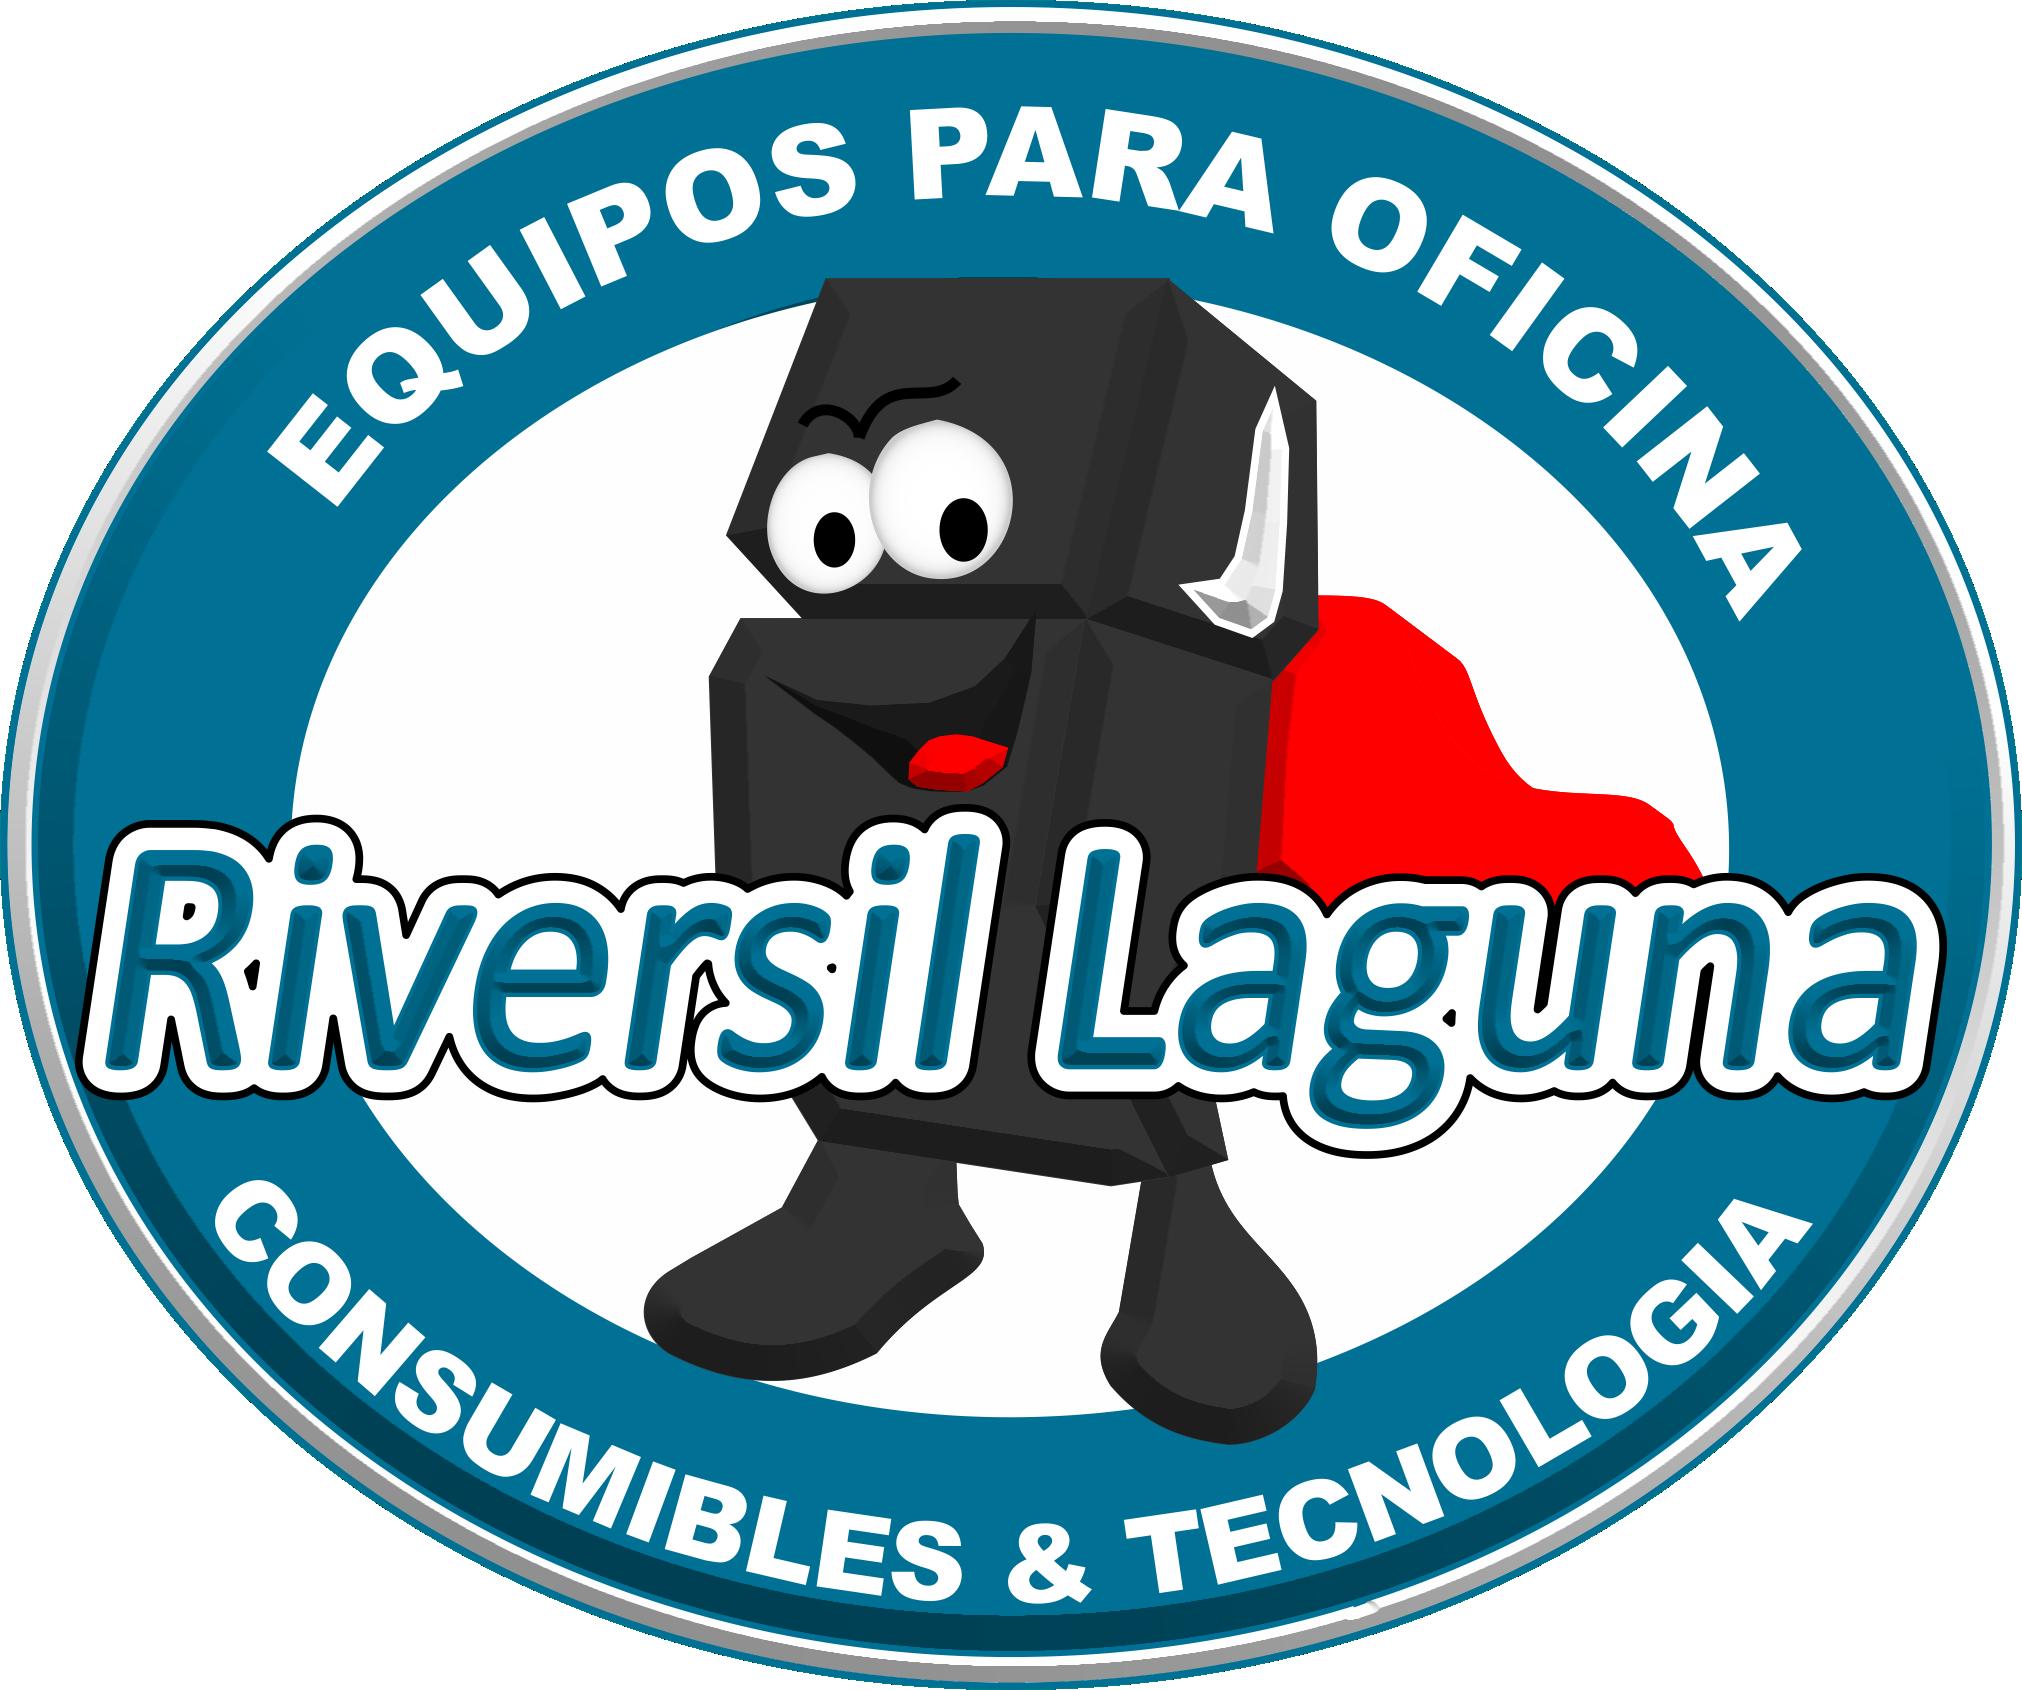 Riversil Laguna S.A de C.V.